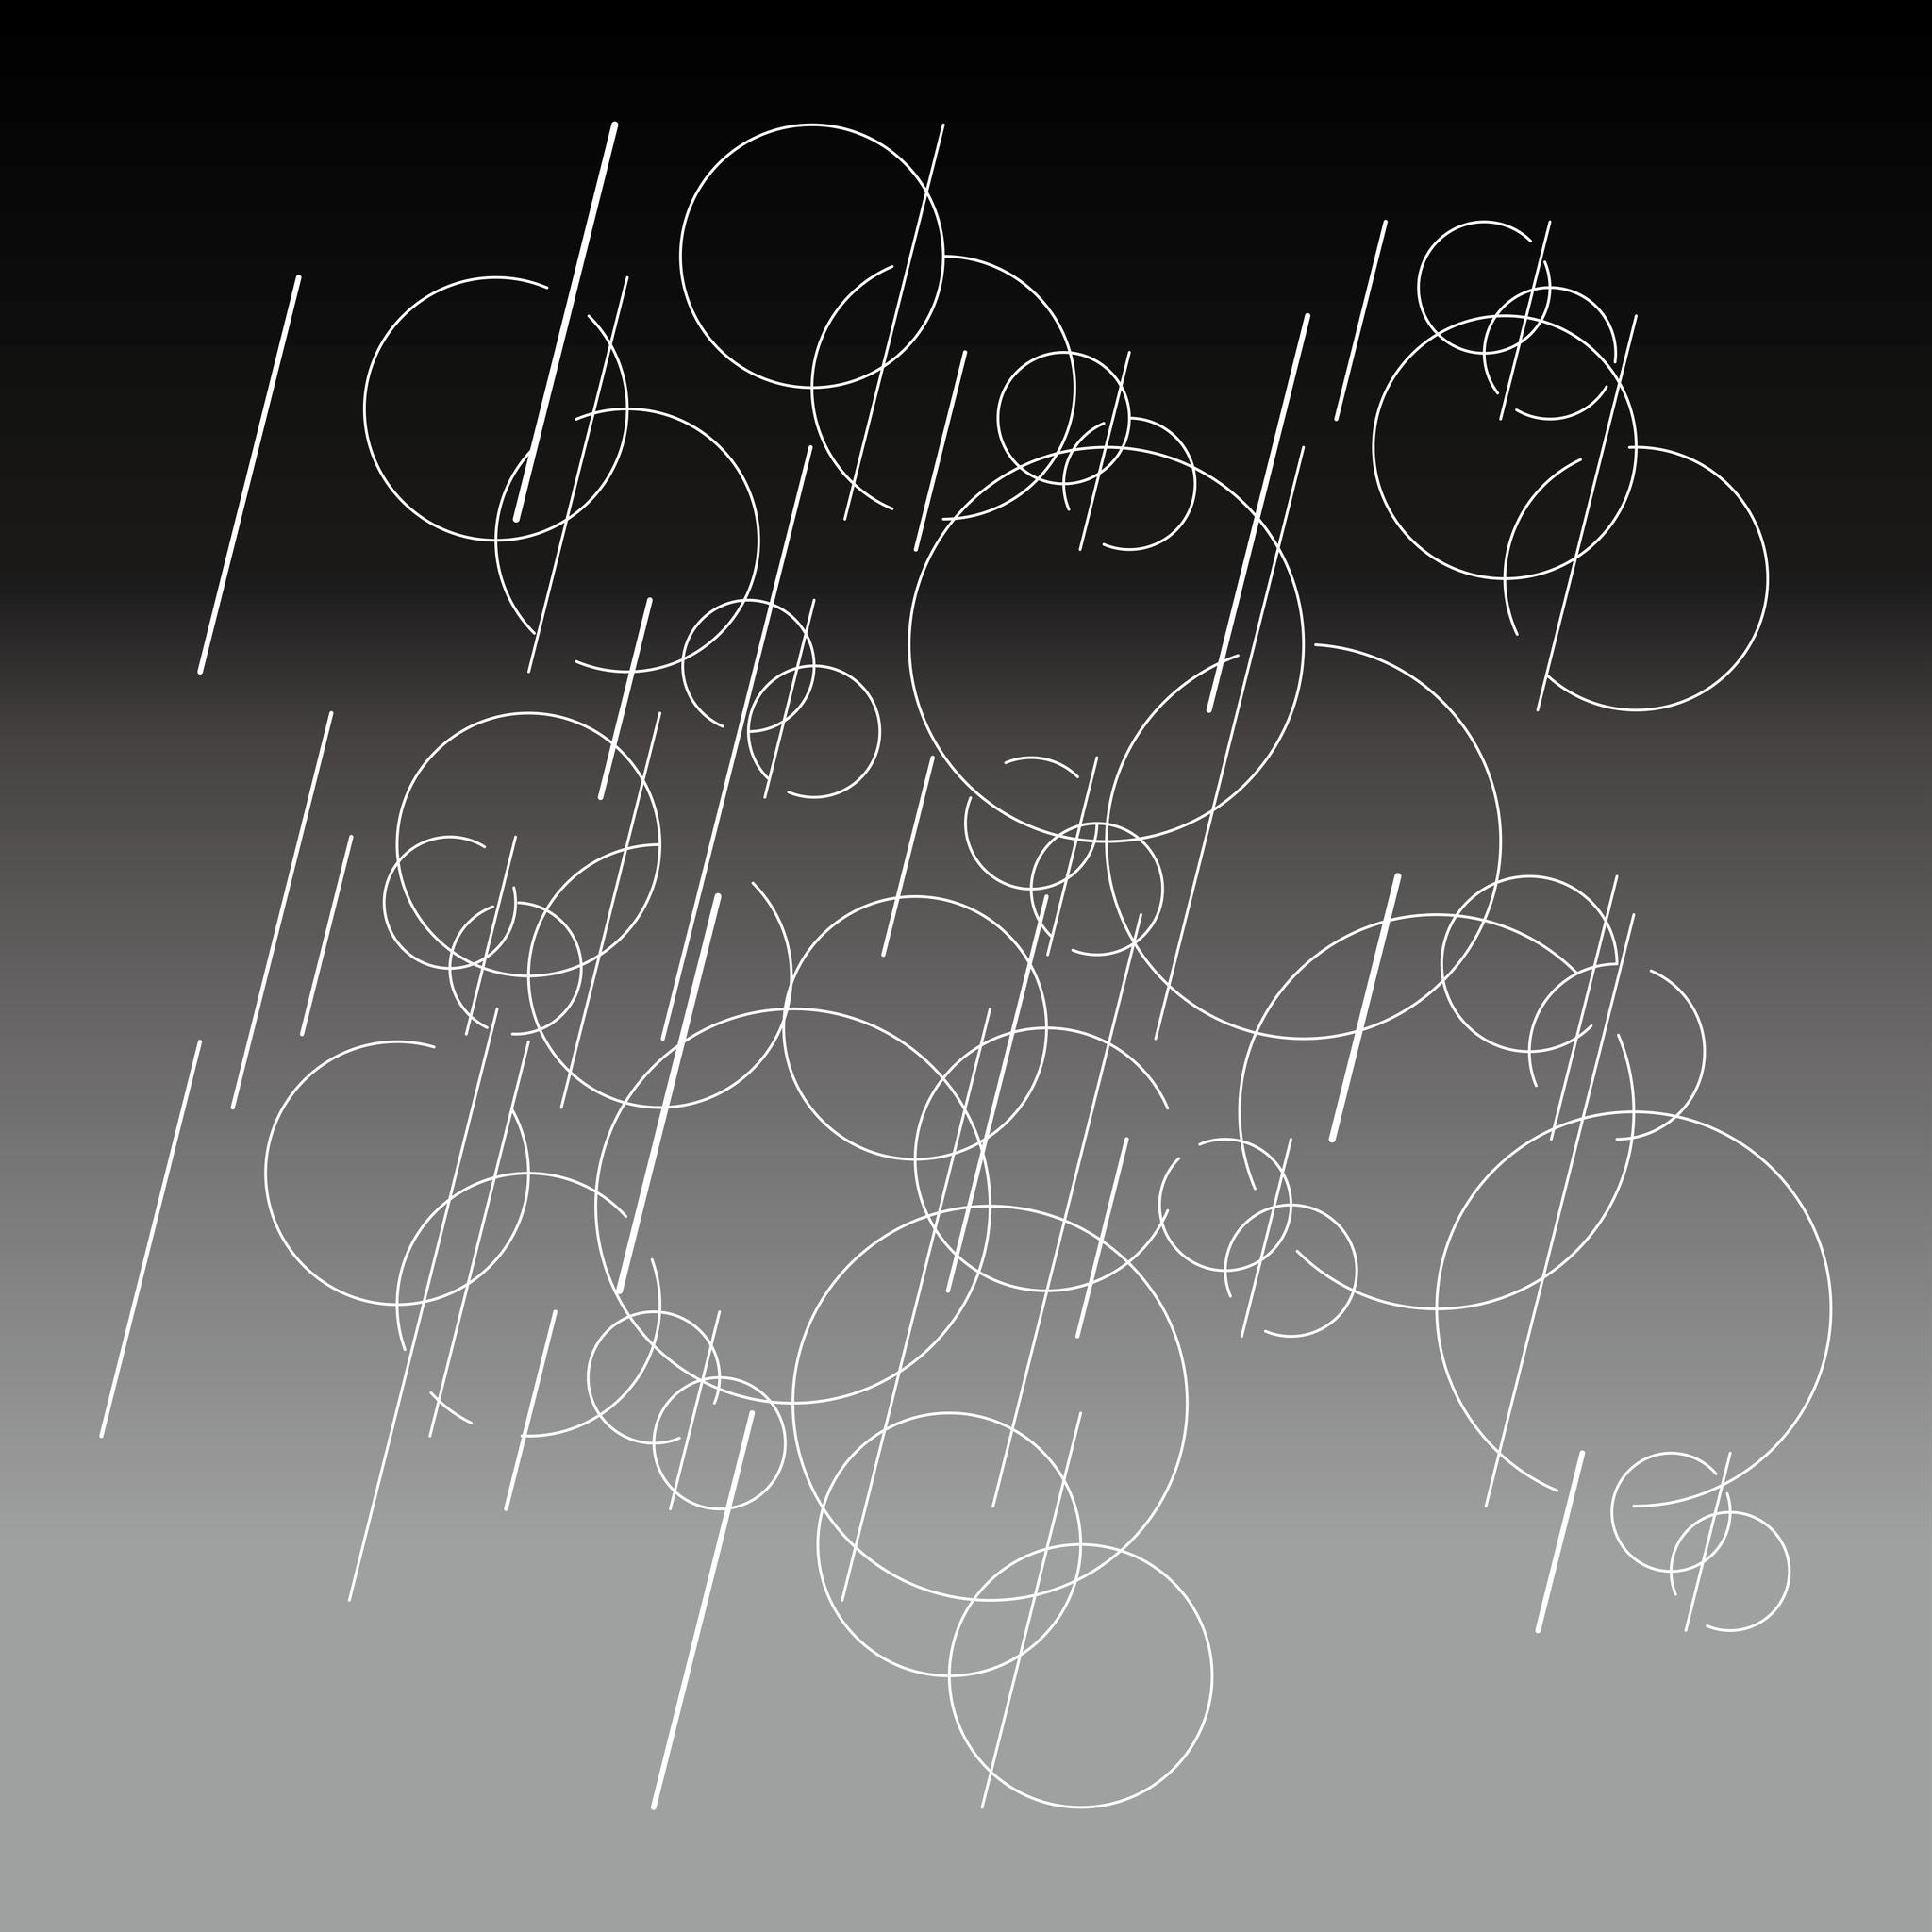 4th Album「1%の革命前夜」2020.12.15 Release